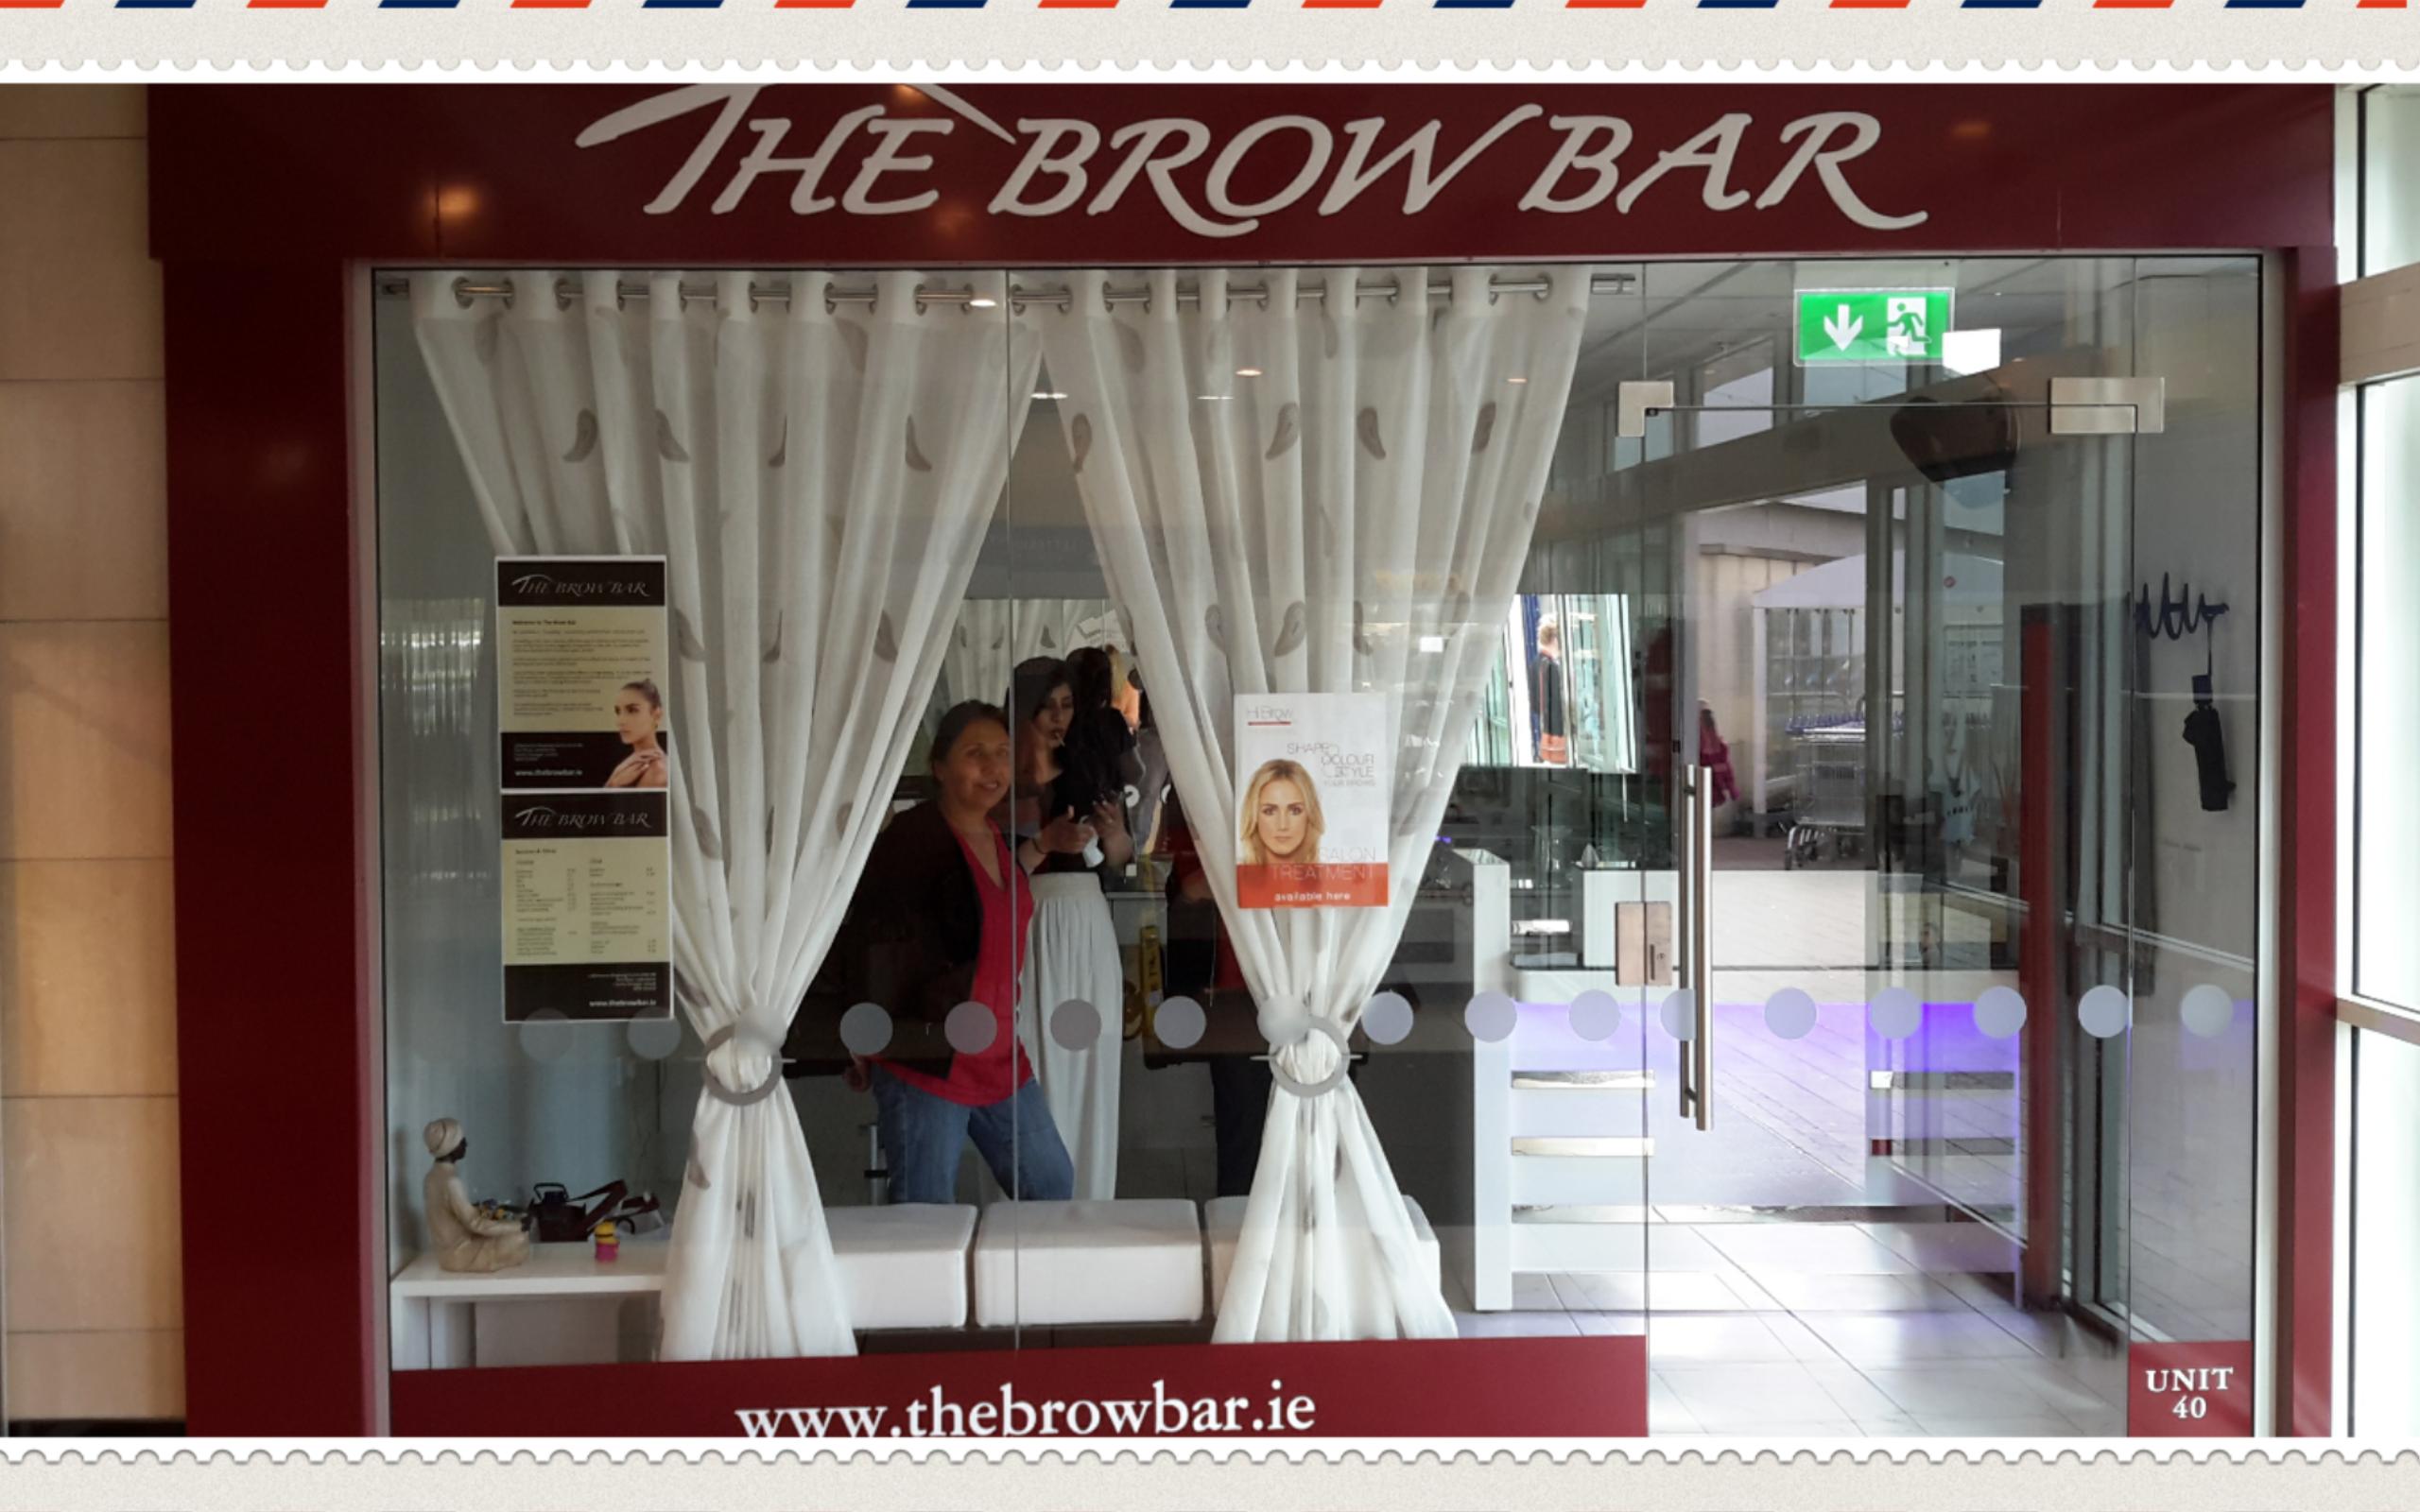 The-Brow-Bar-Letterkenny